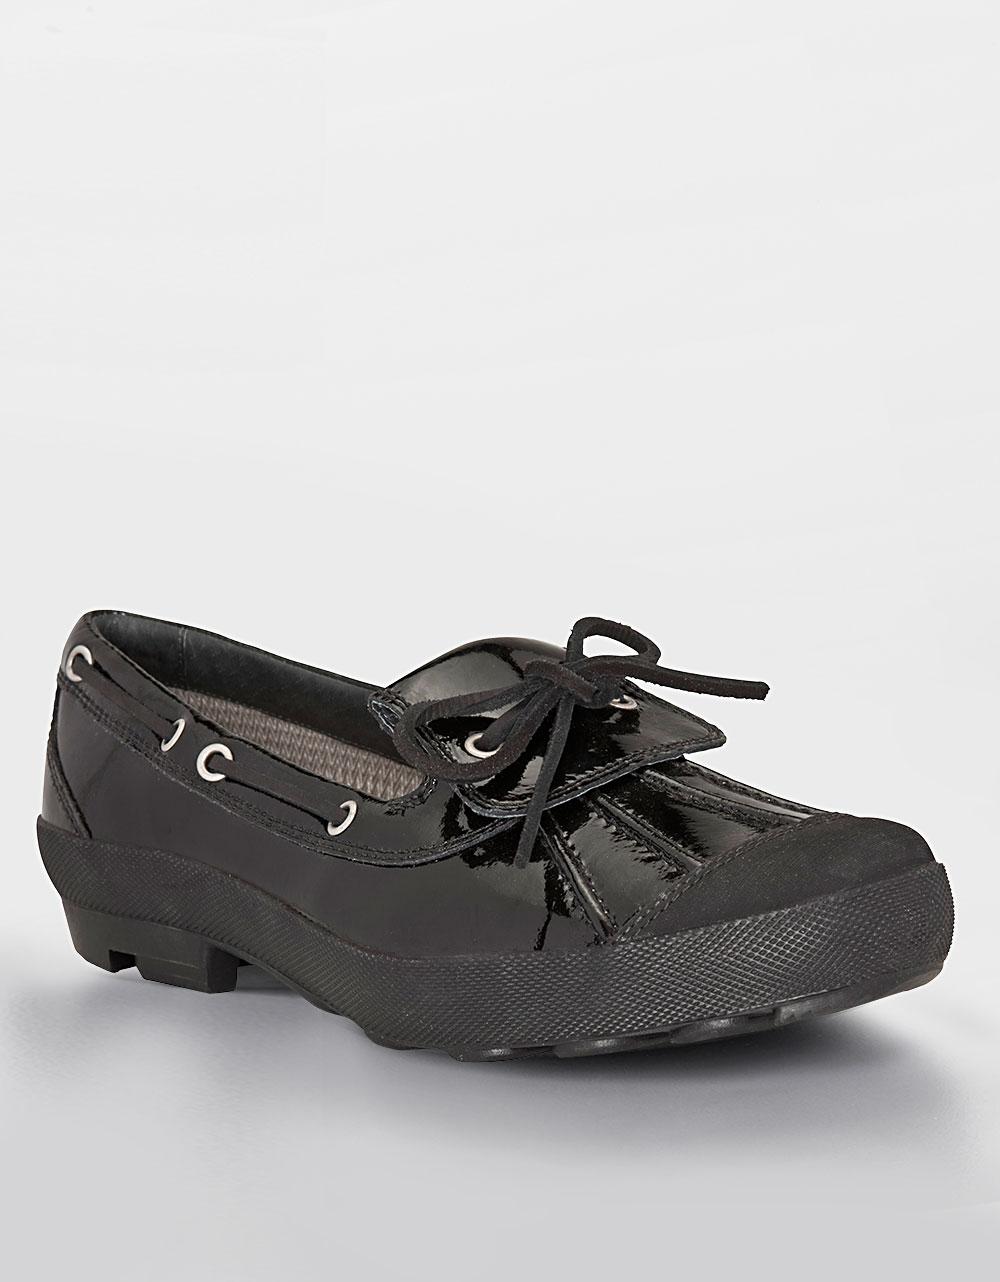 black ugg rain shoes